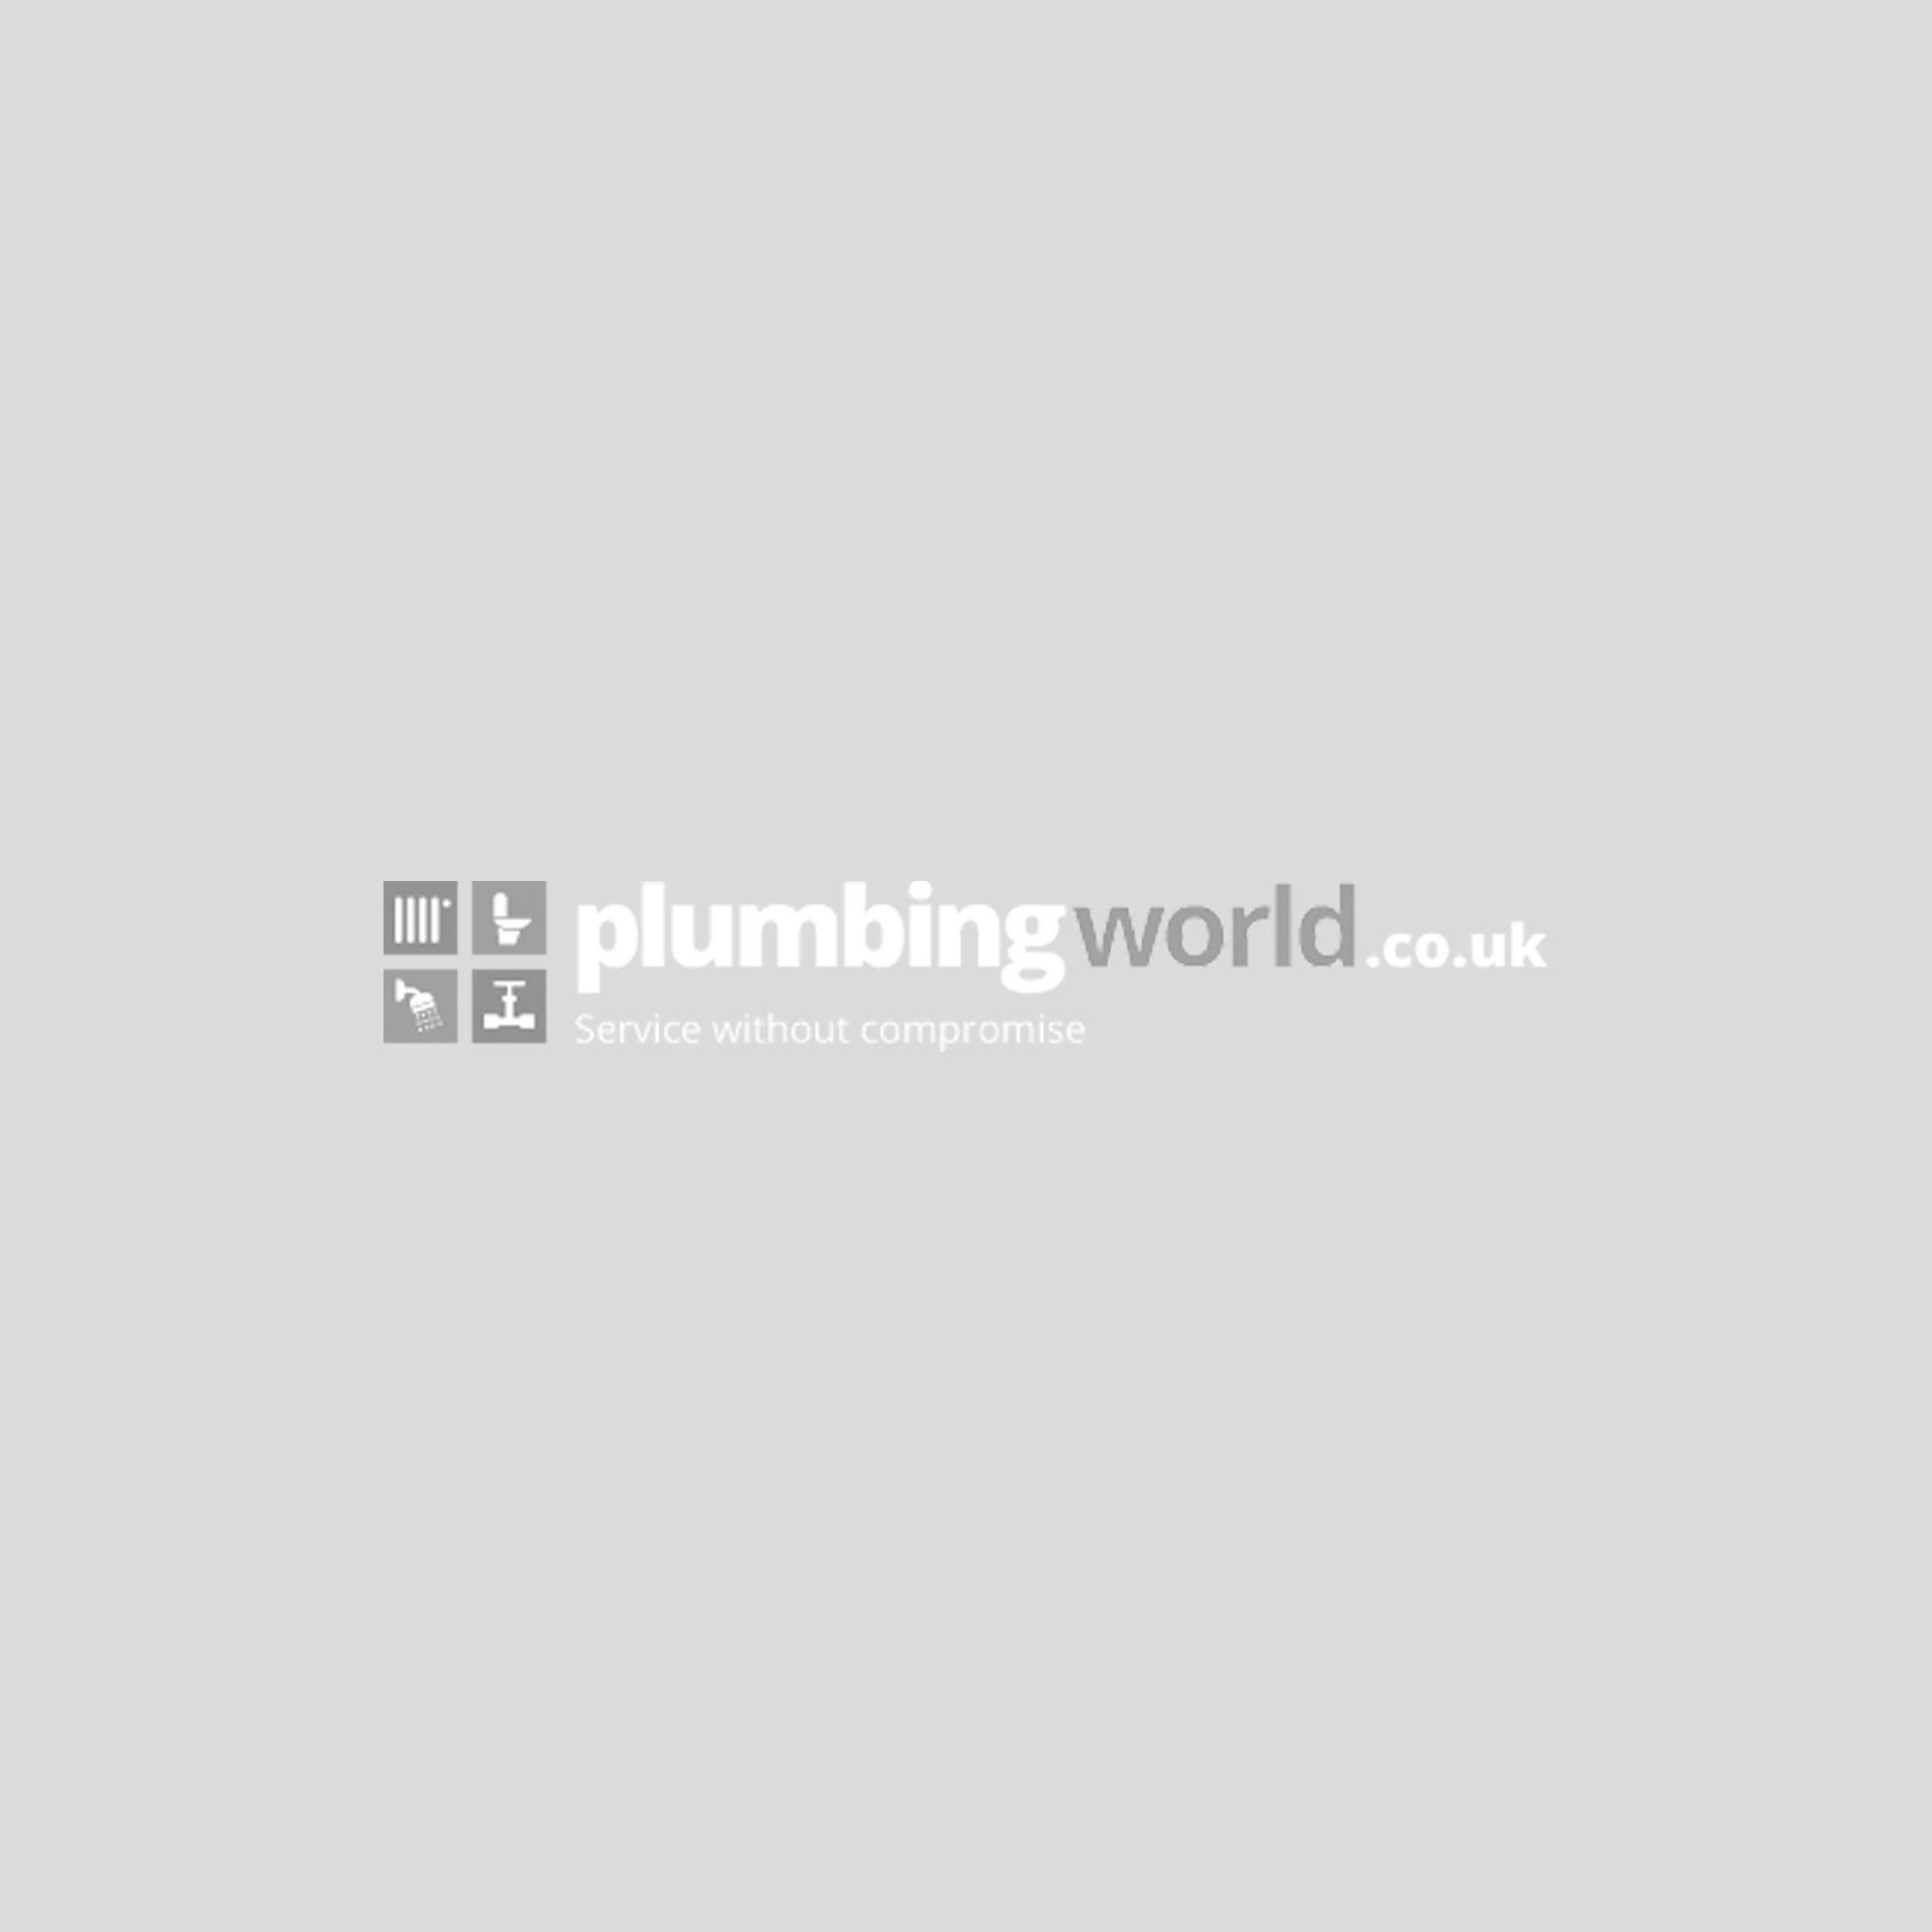 1200mm wide x 2400mm High x 10mm Depth PVC Shower Panel - Travertine Stone